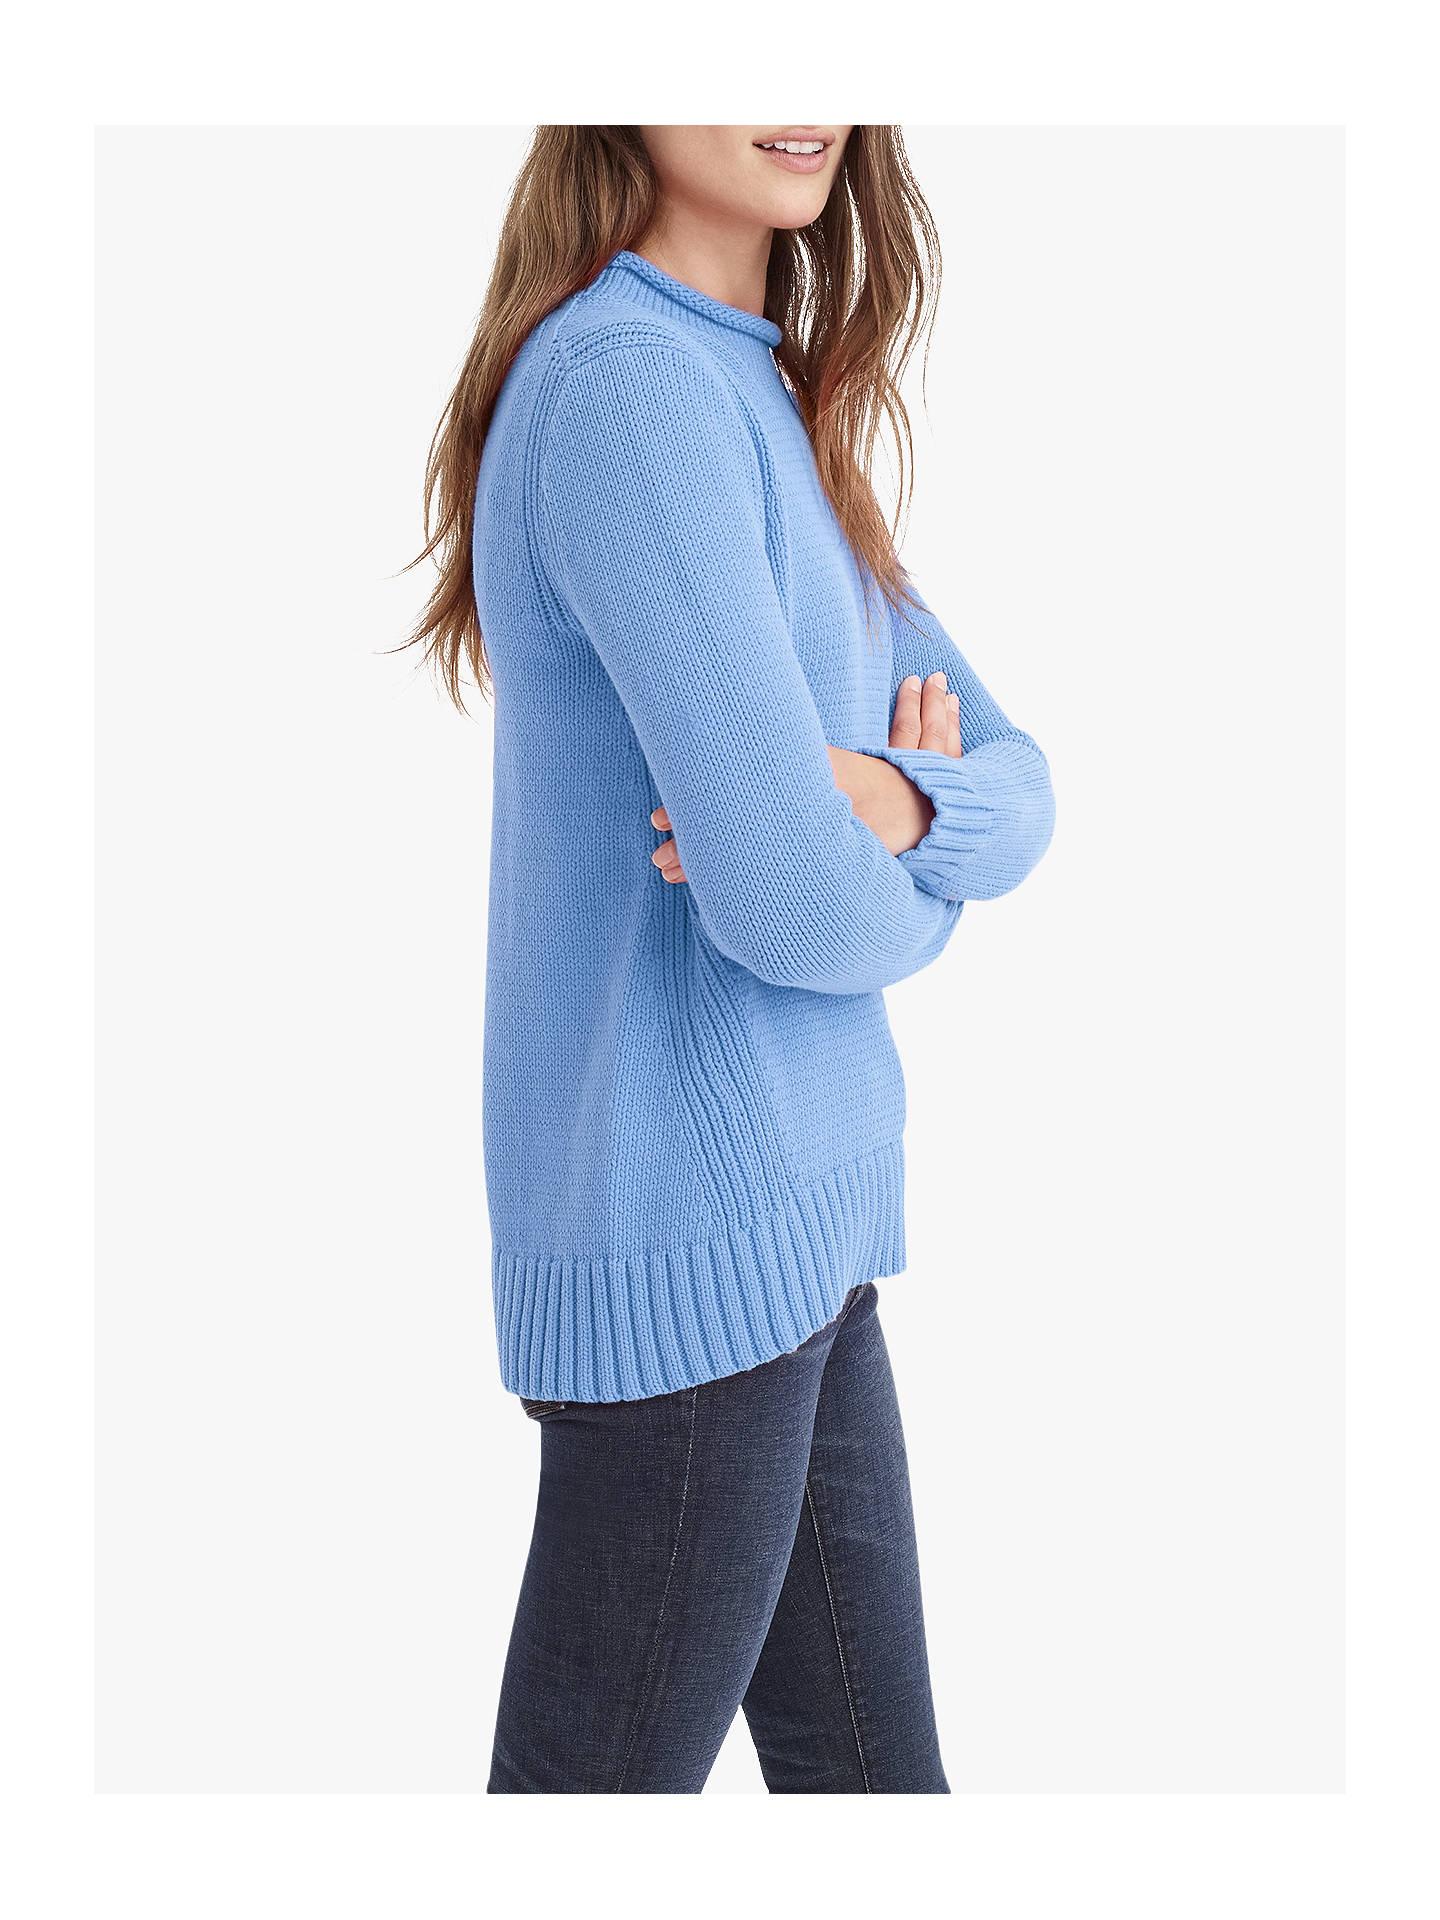 Jcrew 1988 Rollneck Sweater Mediterranean Coast